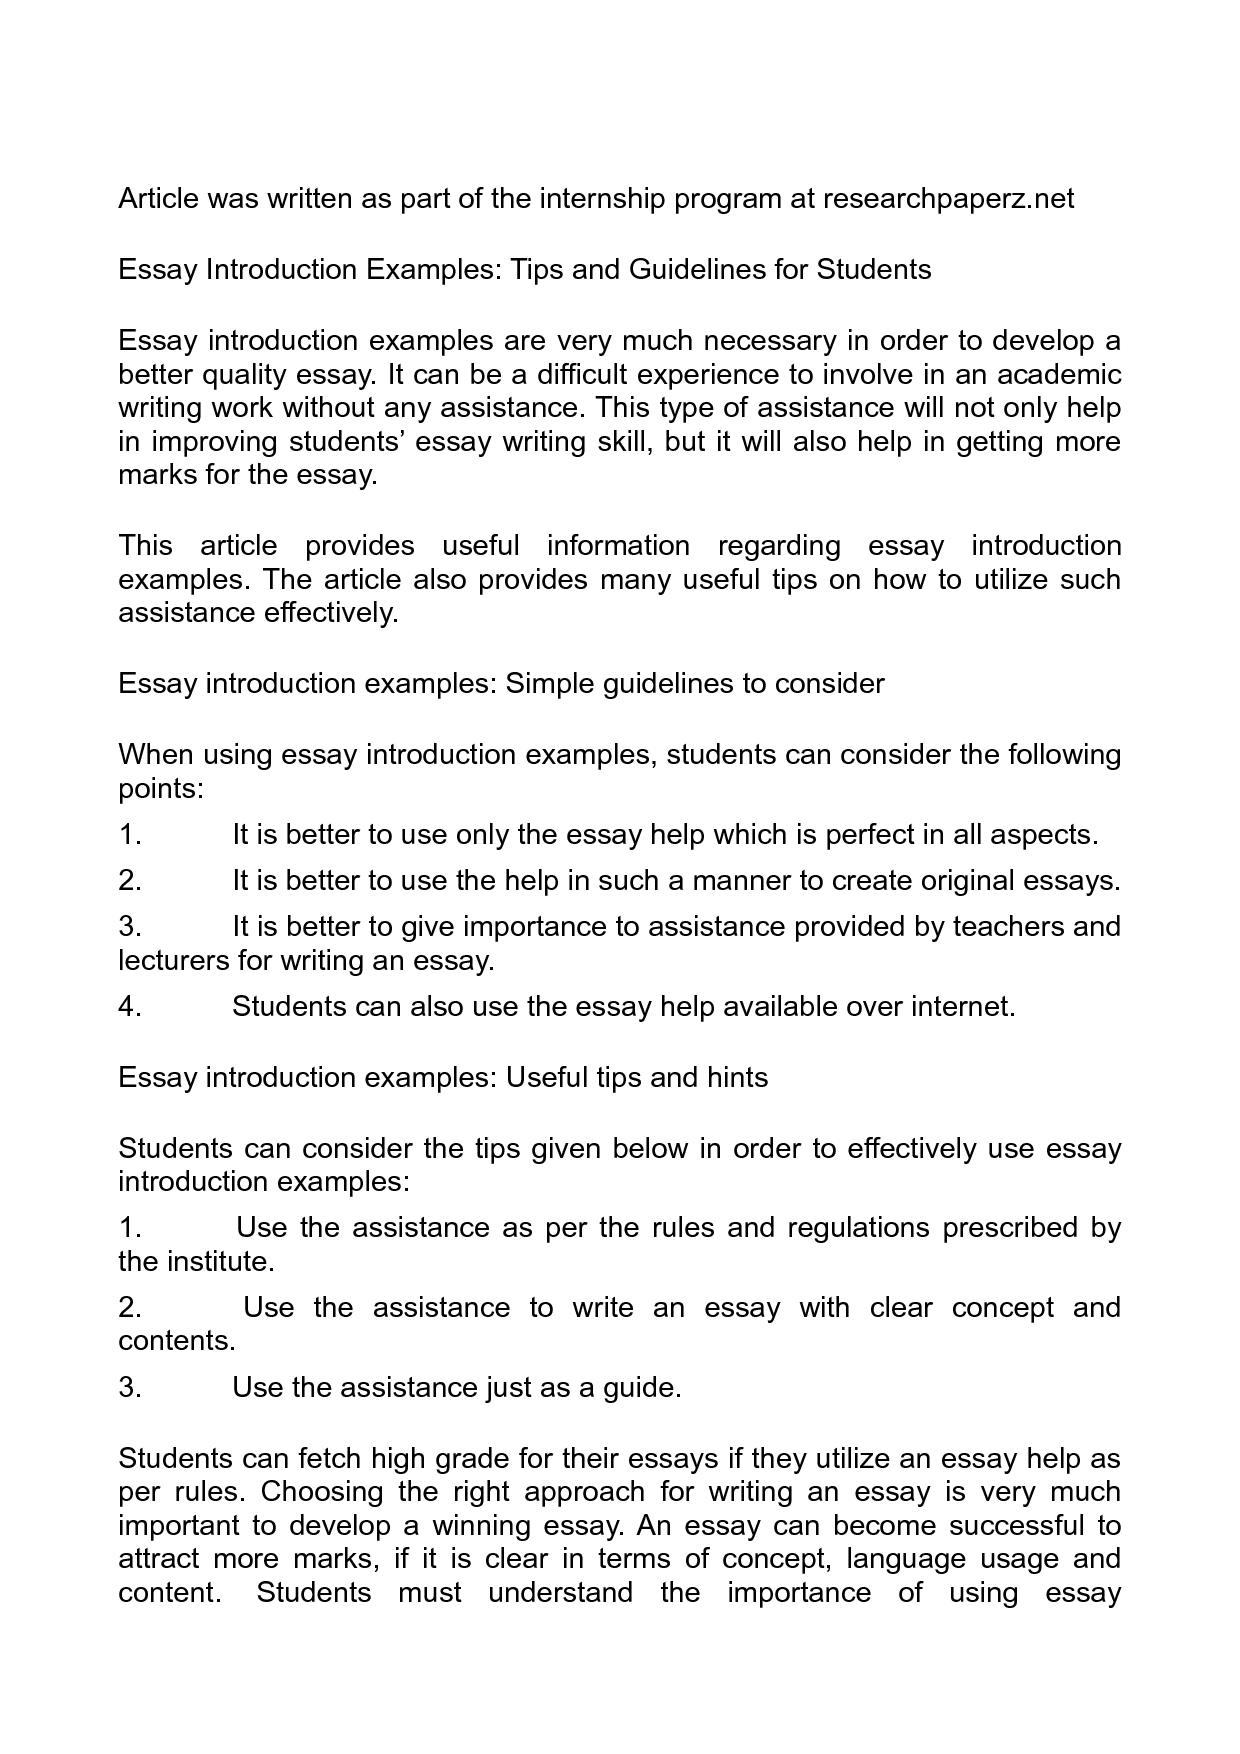 003 Eyx5t6okob Essay Example Sensational Hook Generator Free Hooks About Identity Expository Examples Full